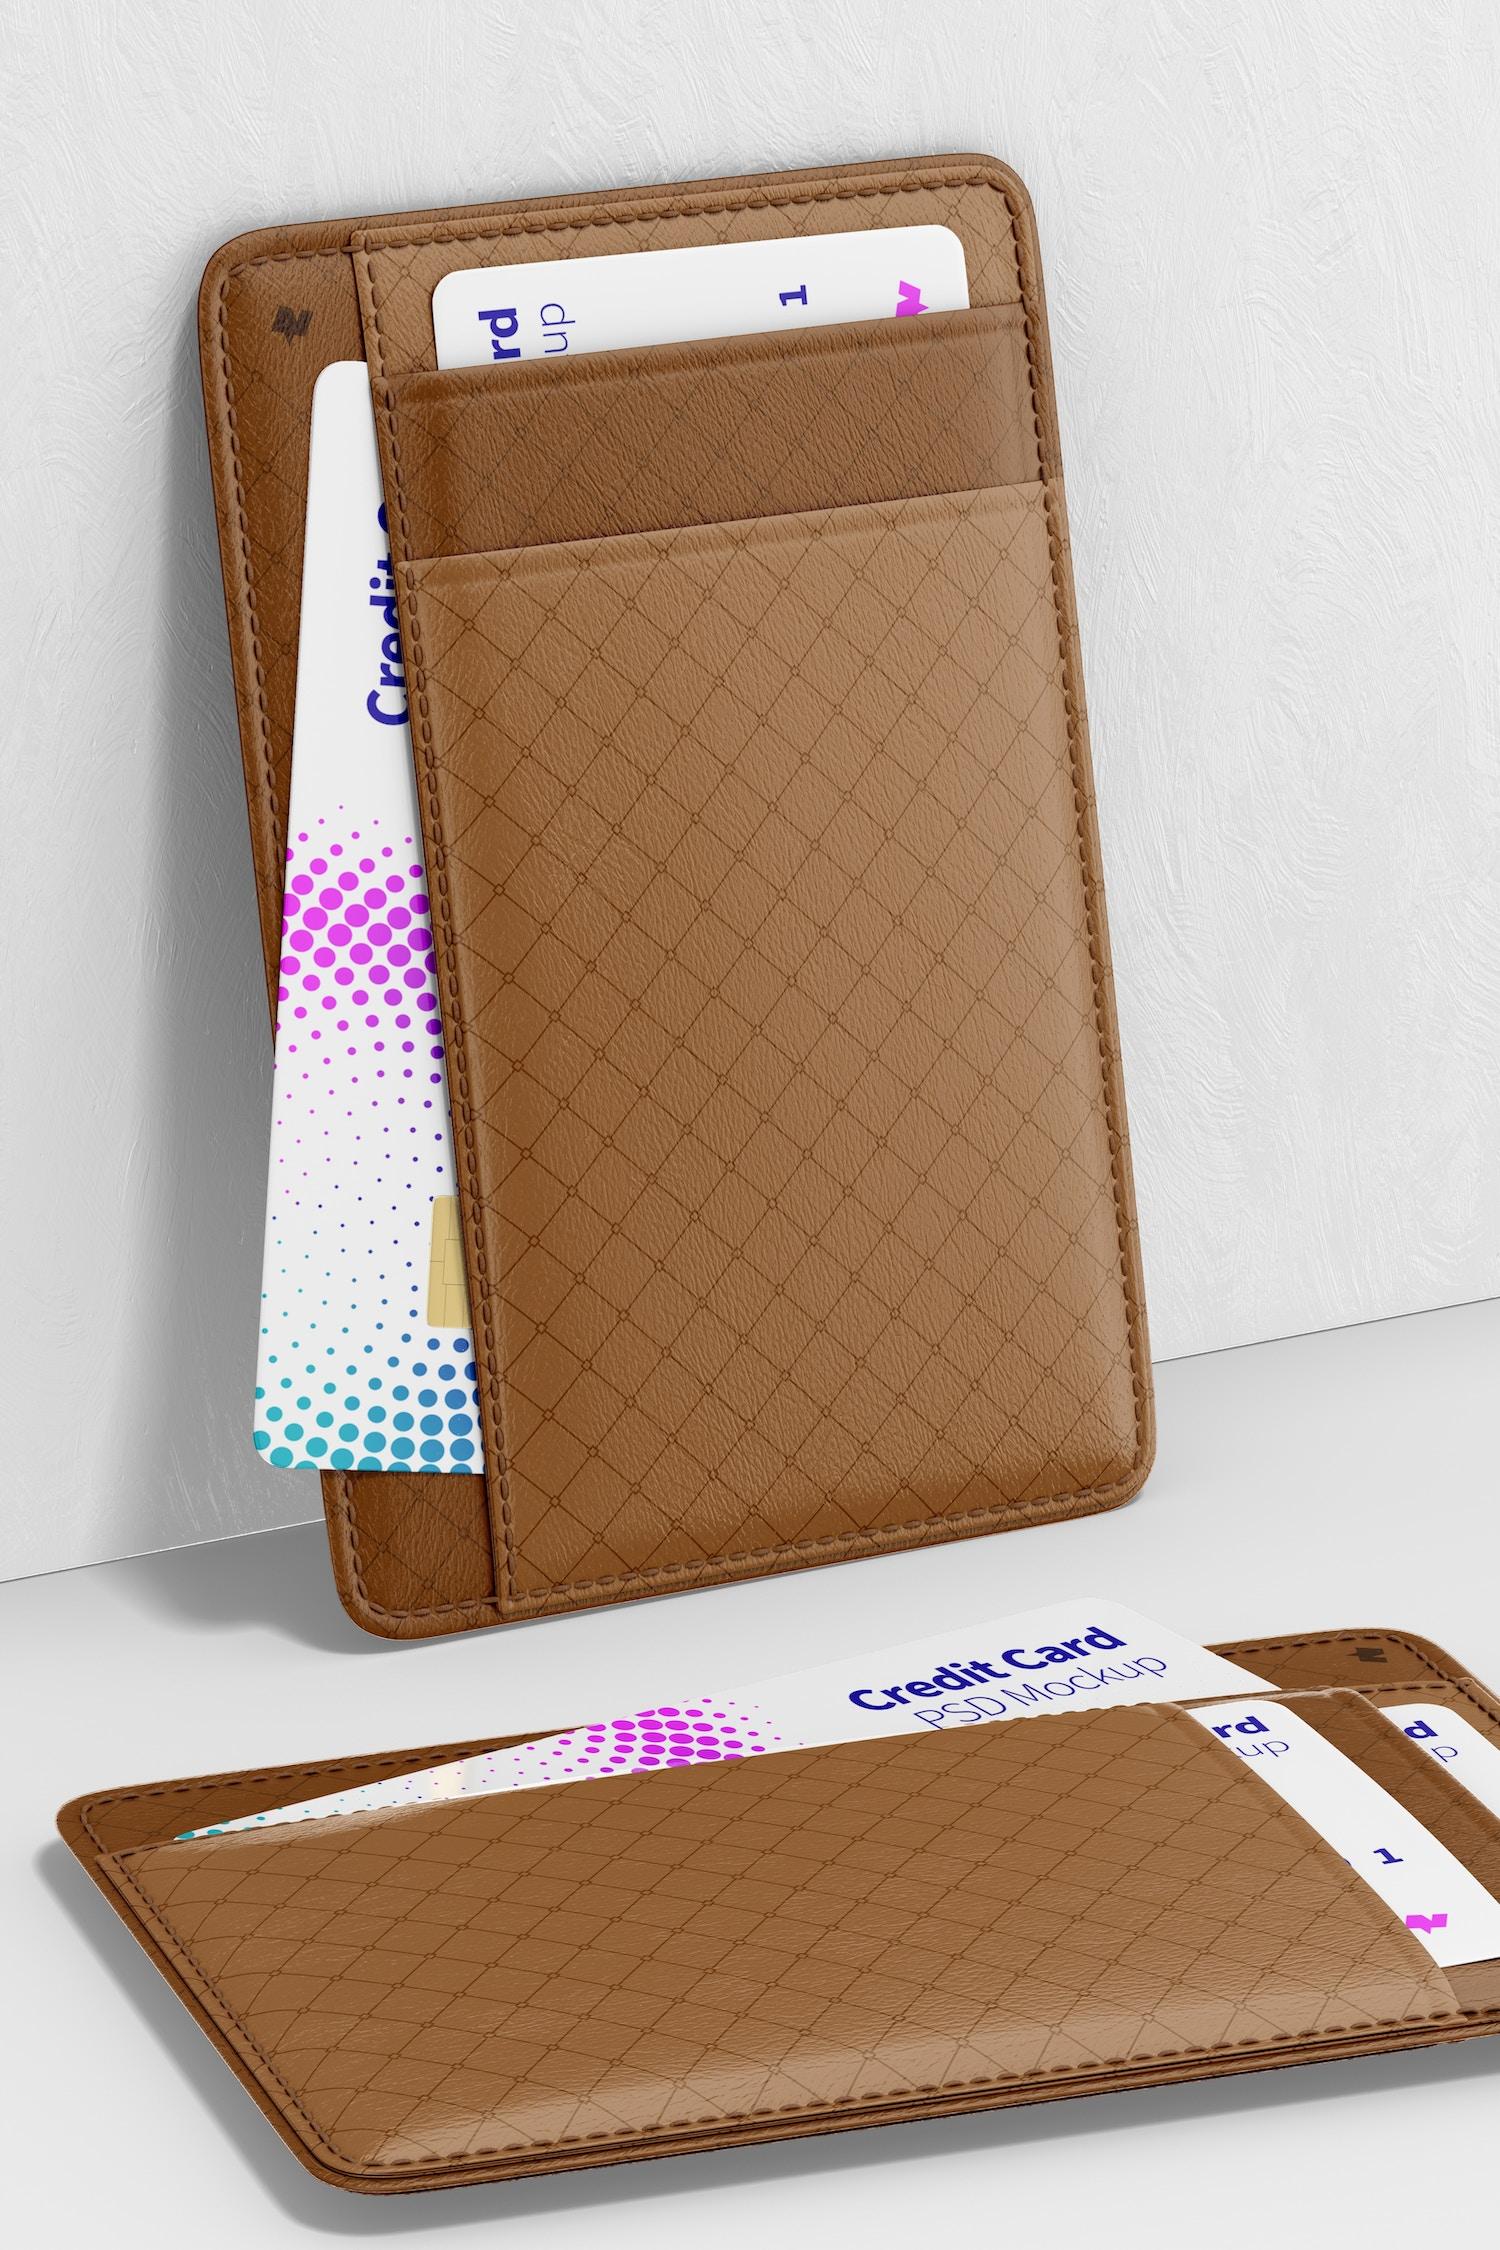 Leather Slim Wallet Mockup, Leaned